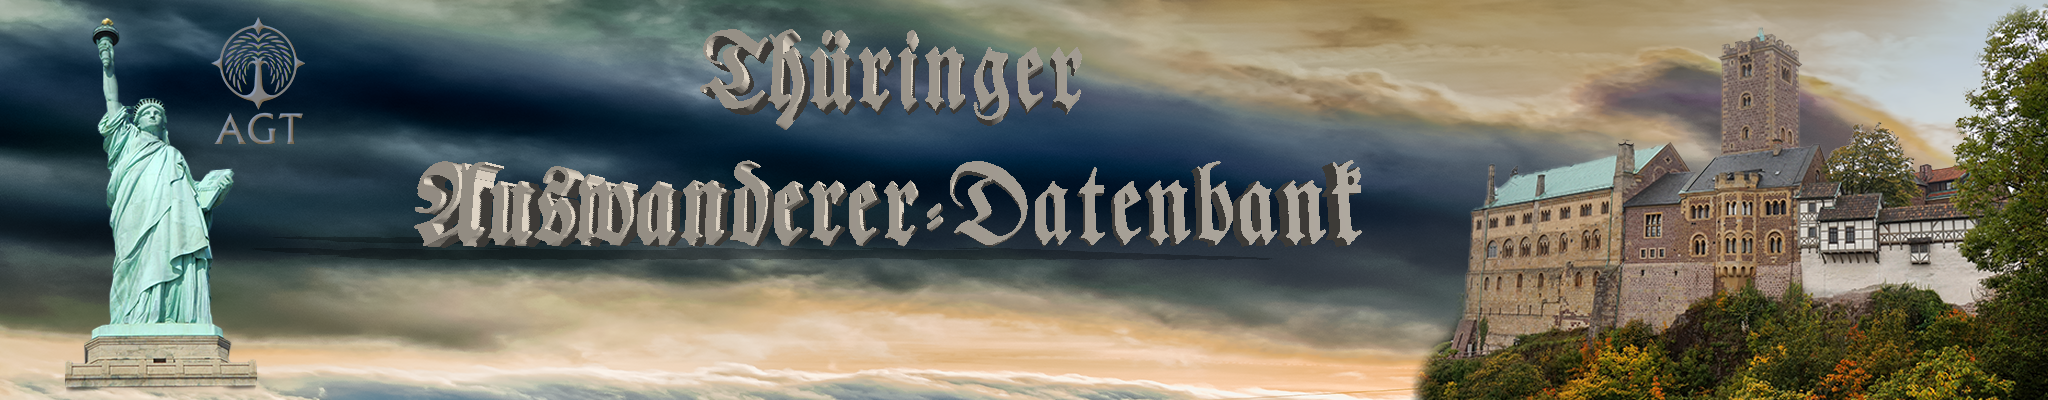 Thüringer Auswanderer-Datenbank